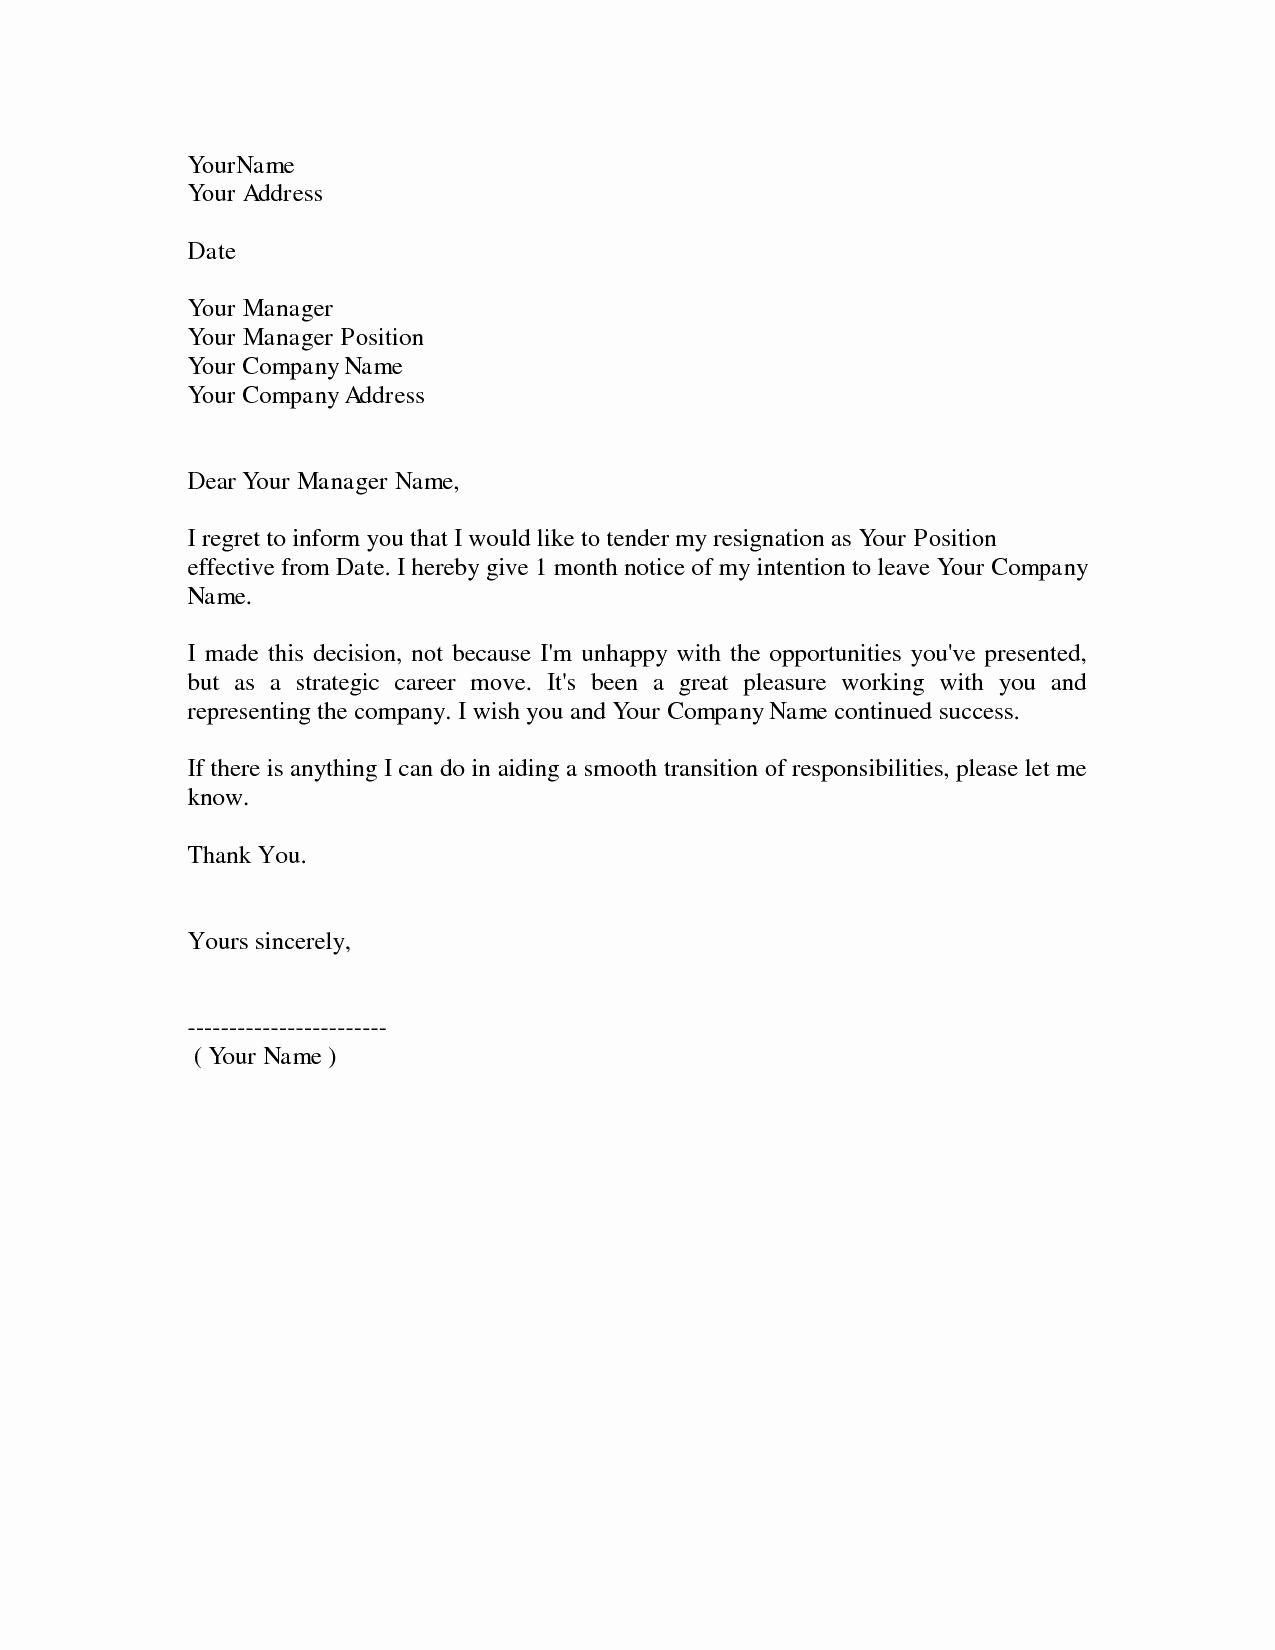 Template for Resignation Letter Lovely Simple Resignation Letter 1 Month Notice as Sample Letter